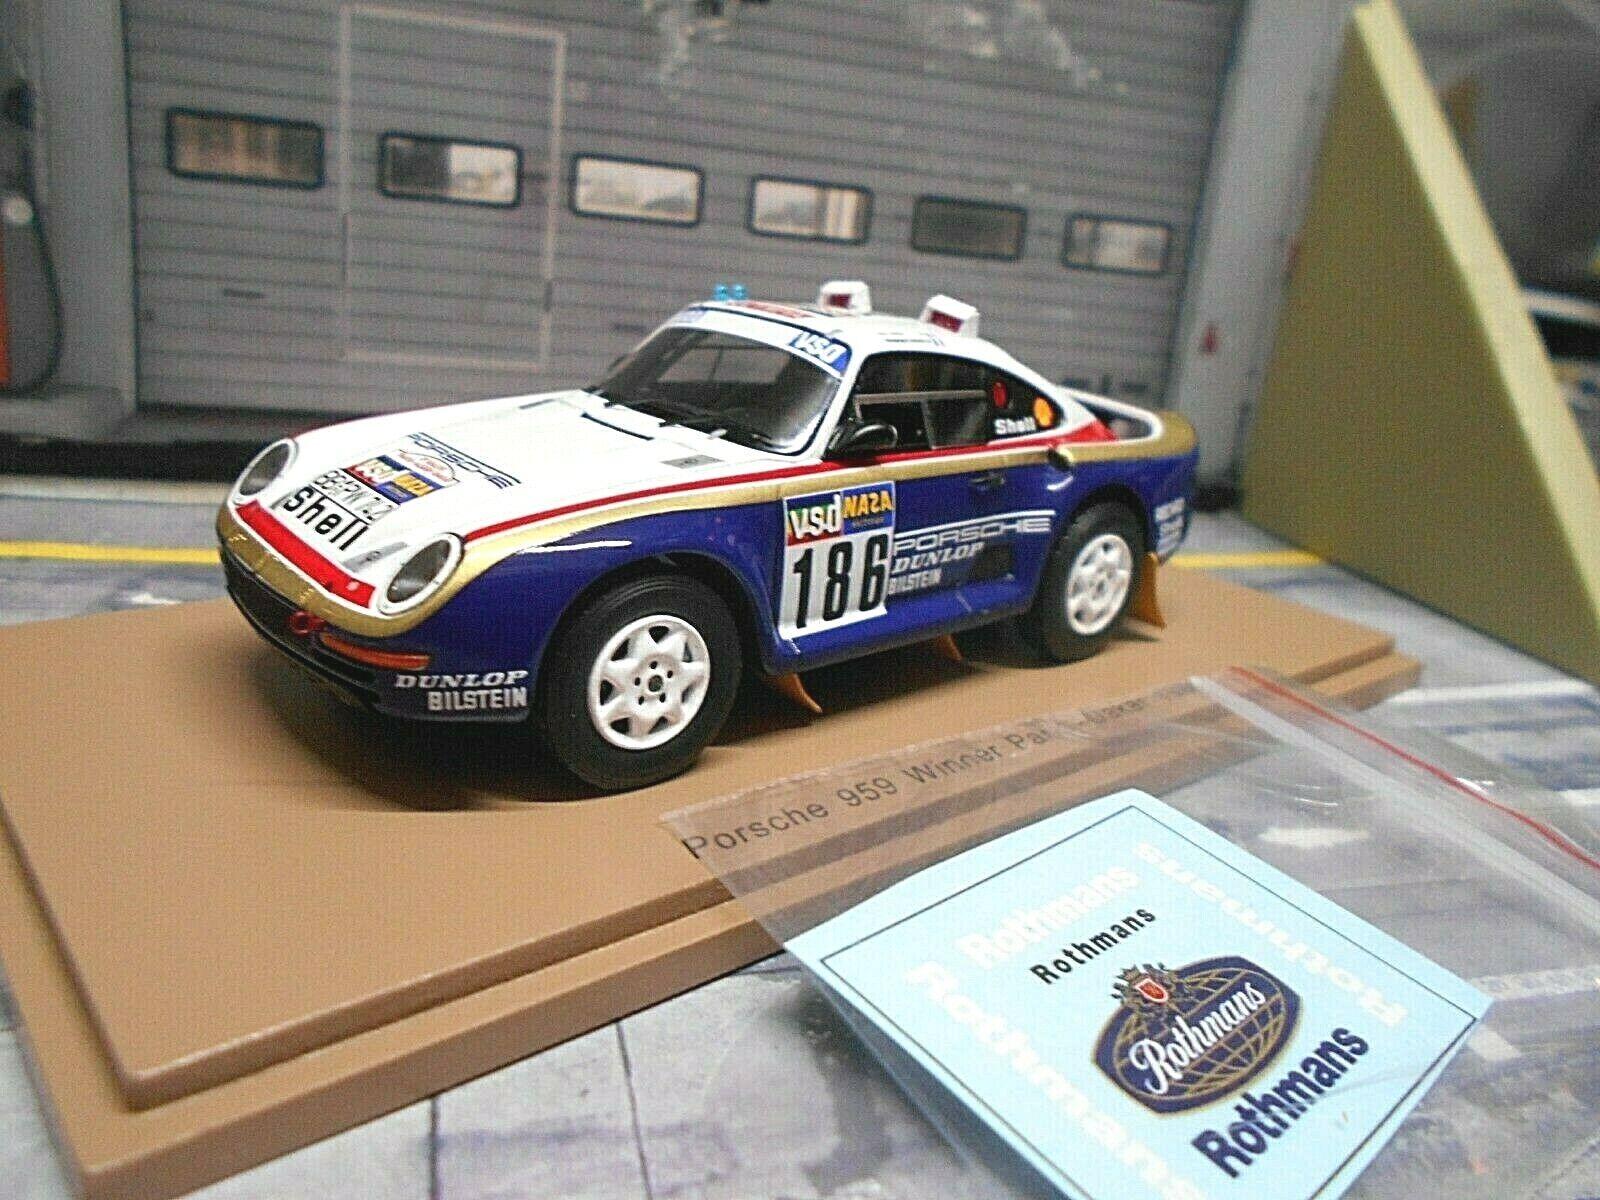 Porsche 911 959 4x4 raid dakar 1986 Metge rossohm a winner Spark resin 1 43